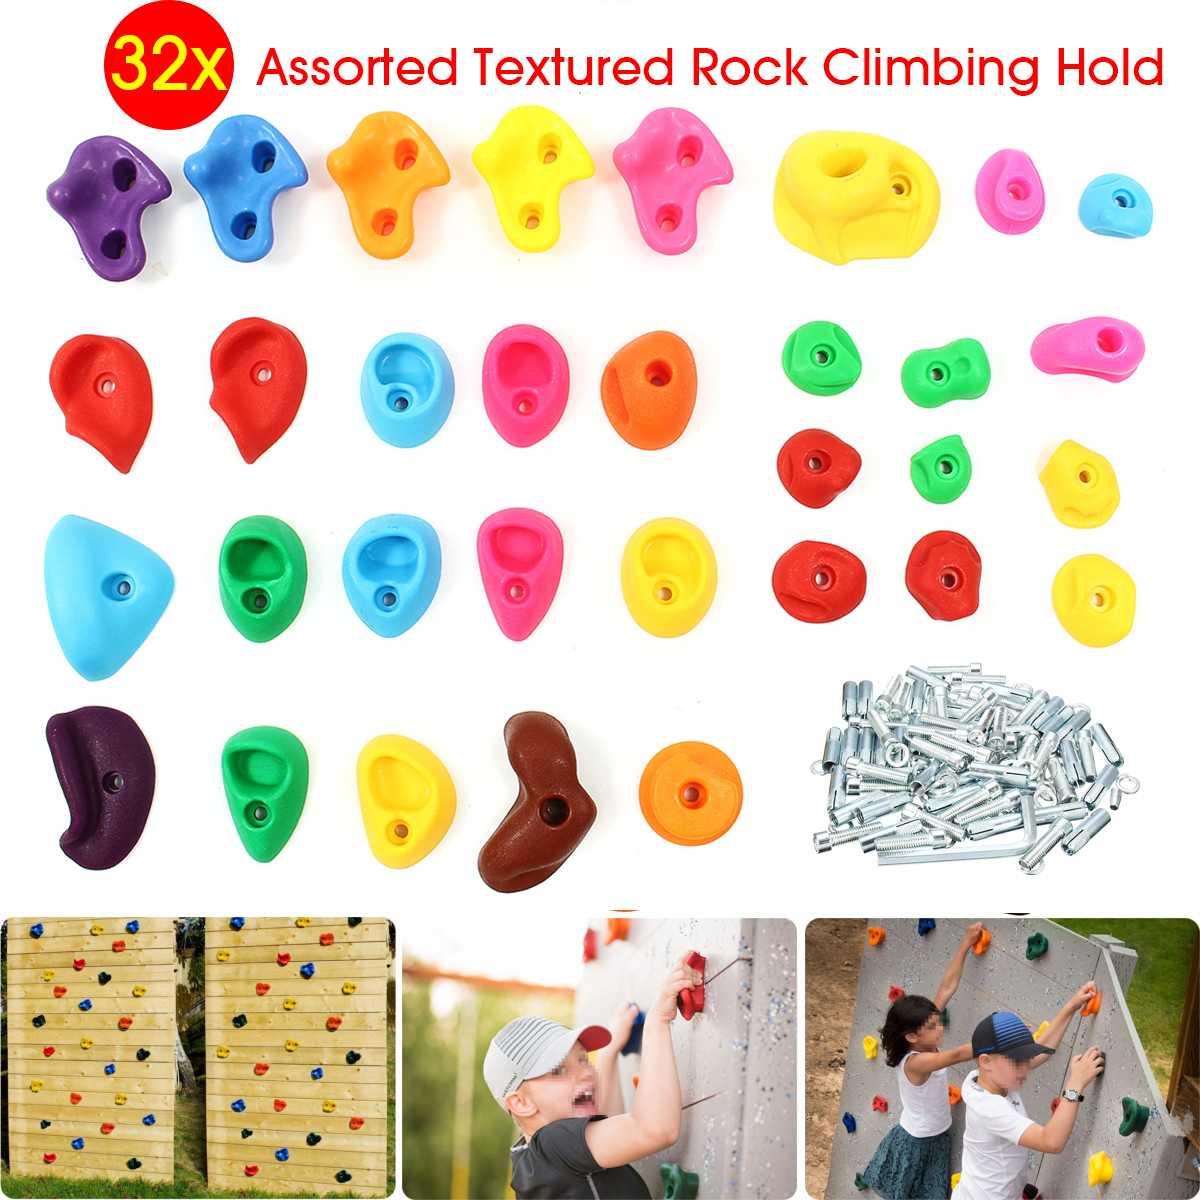 32Pcs/set Assorted Textured Rock Climbing Frame Mixed Color Rock Climbing Wall Stones Hand Feet Holds Grip Kids Sport Toys